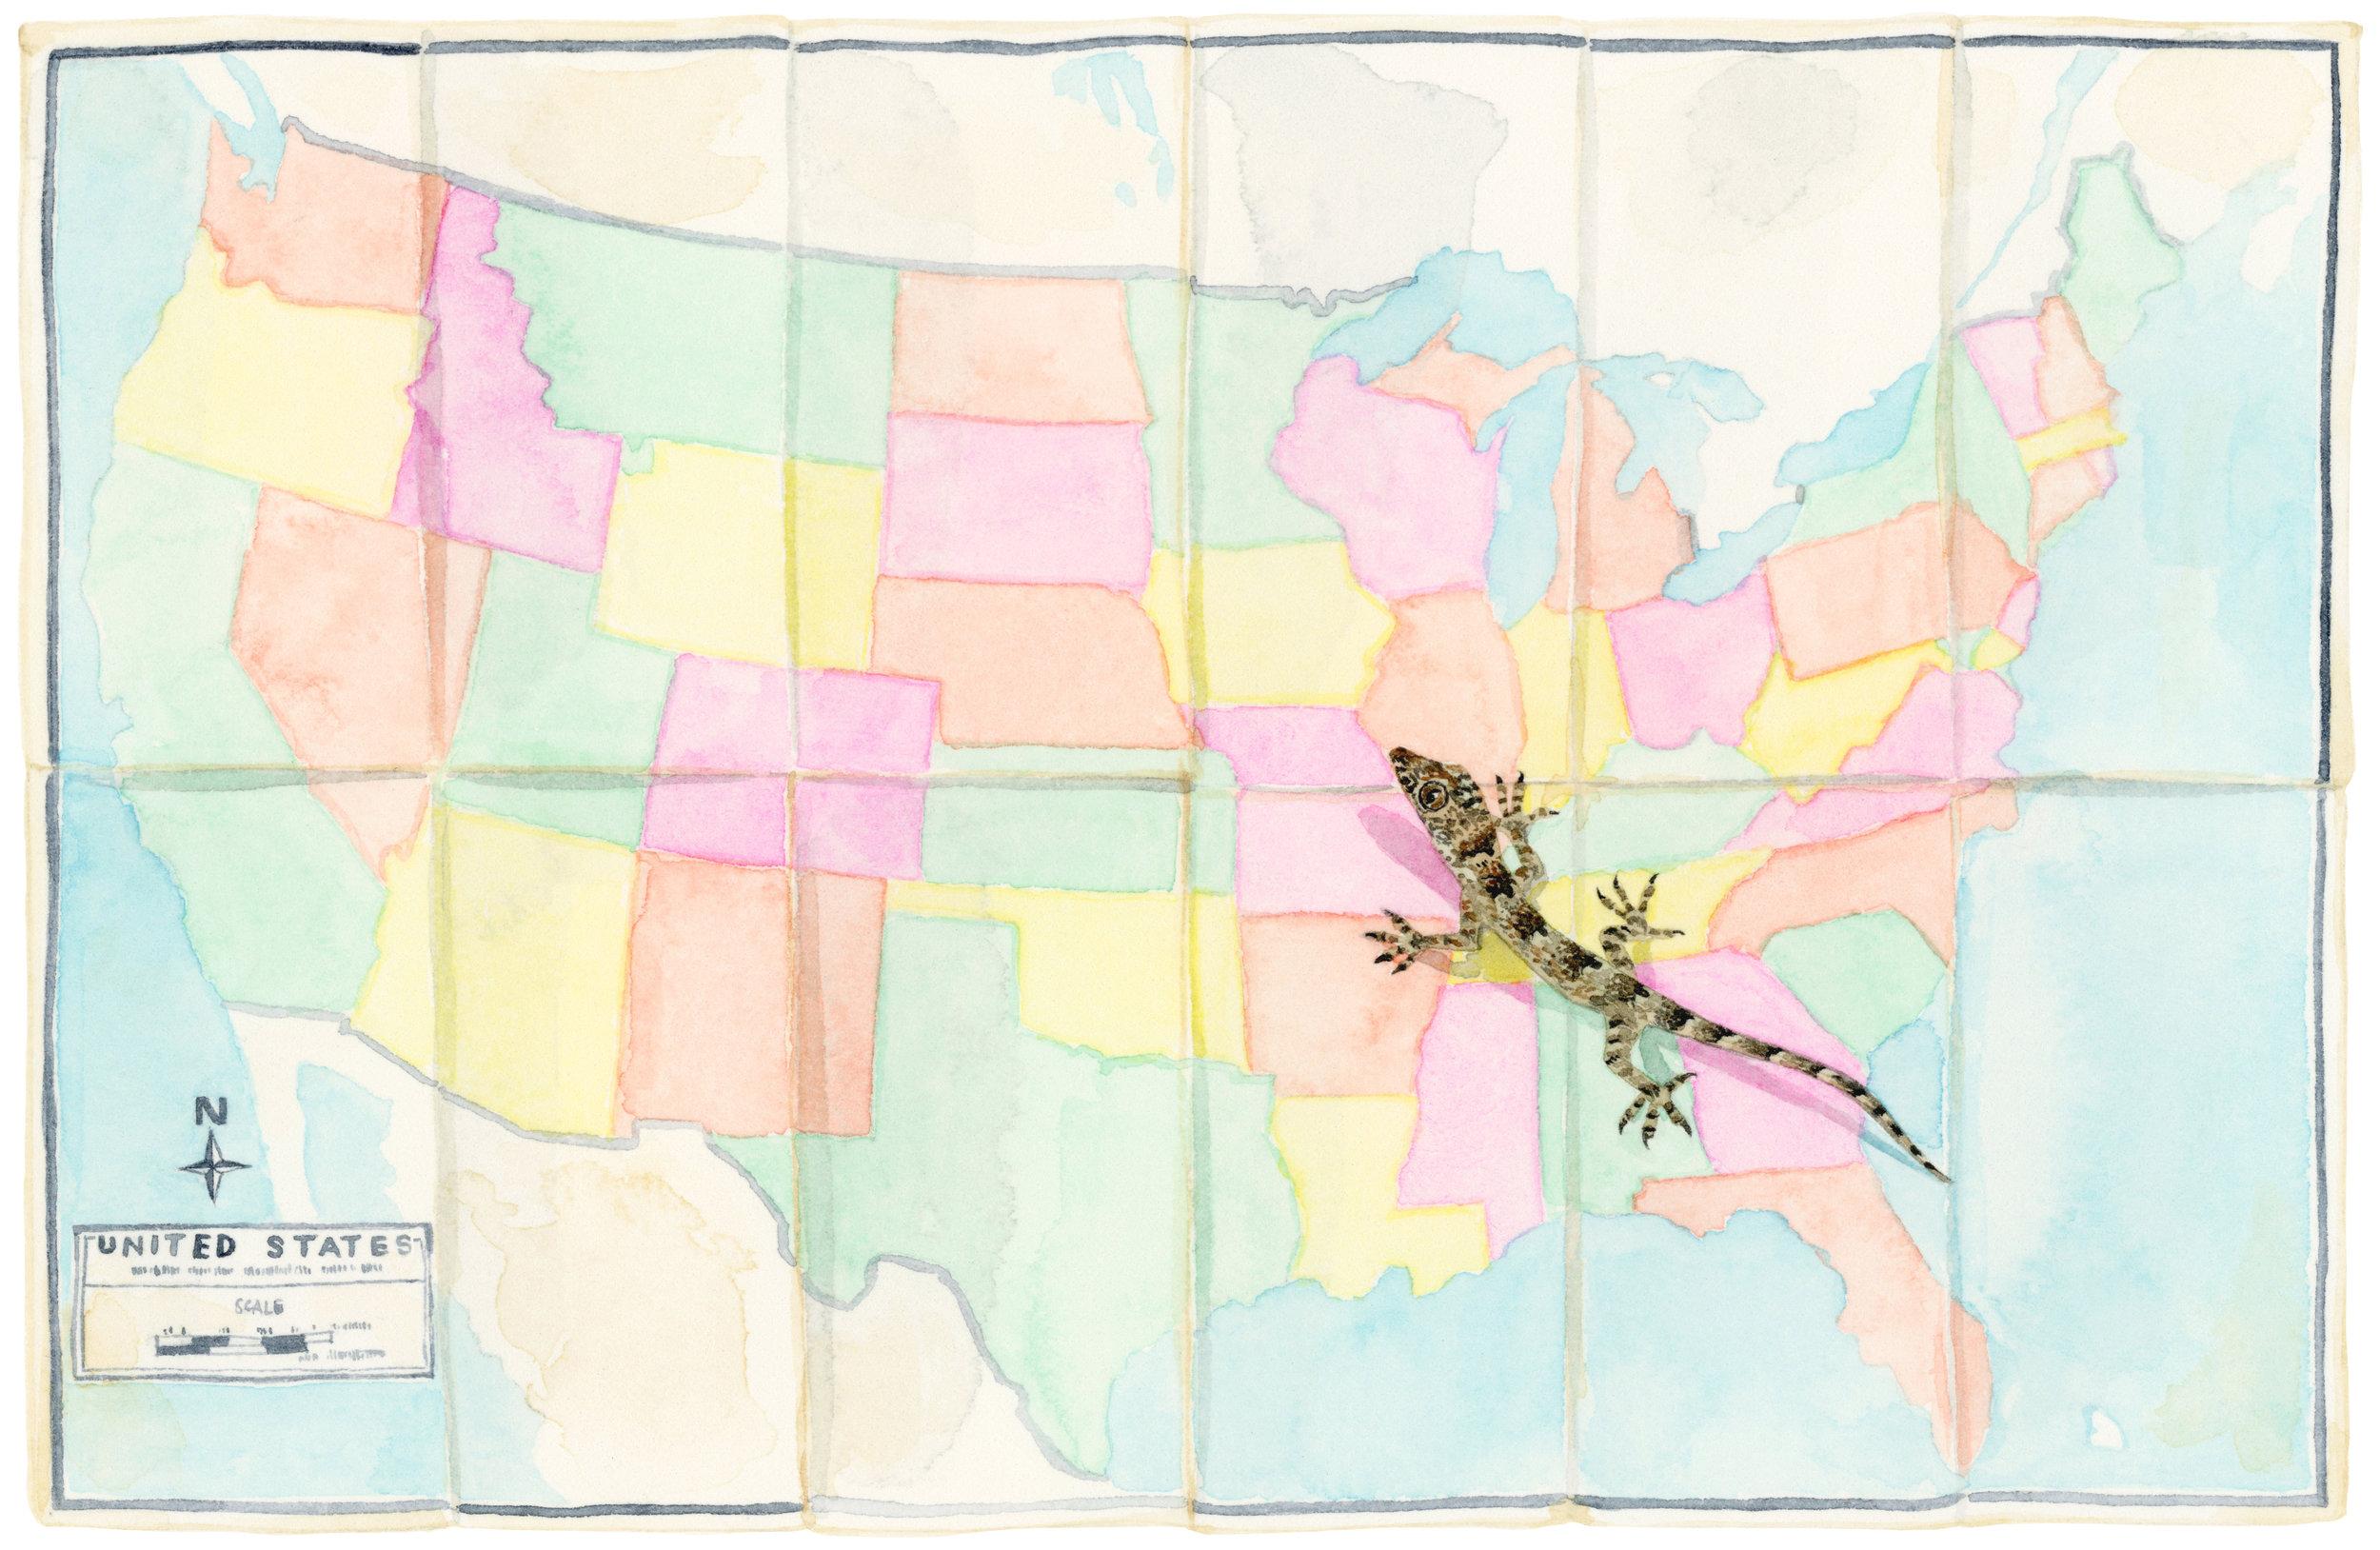 map-states-lizard-lrg.jpg